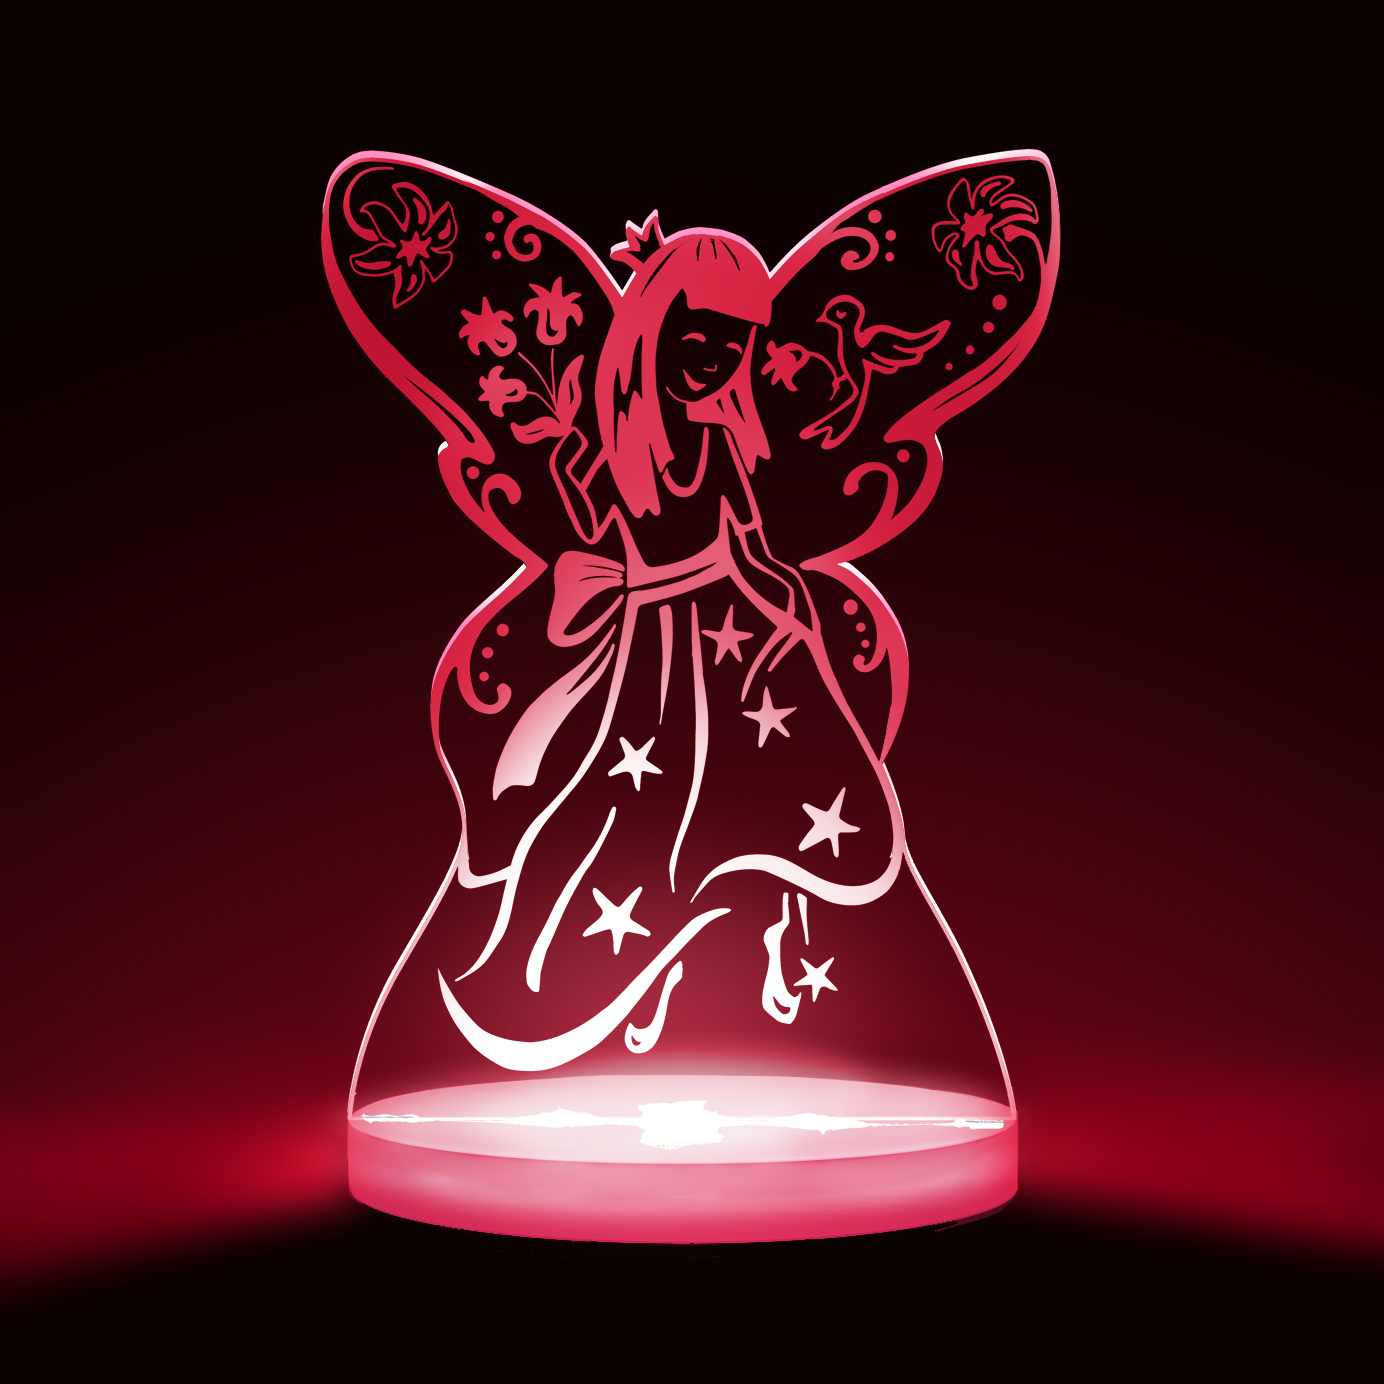 Fairy Princess Multicolored LED Night Light)